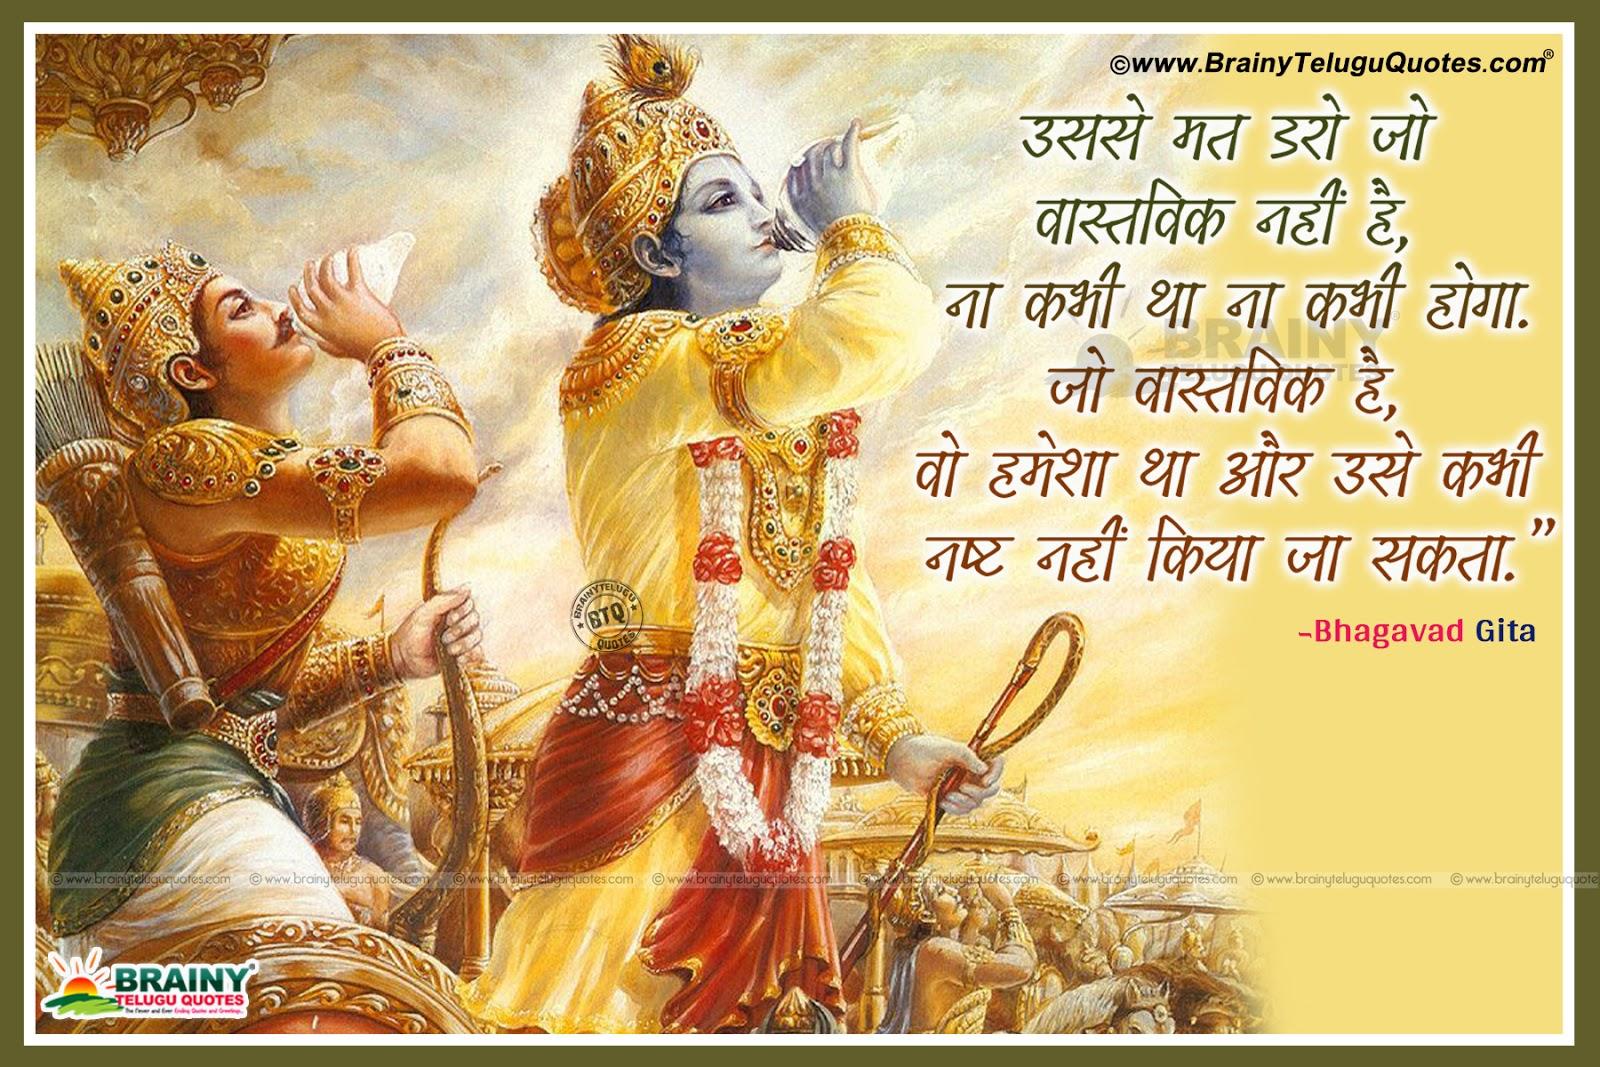 Download bhagavad gita in hindi pdf